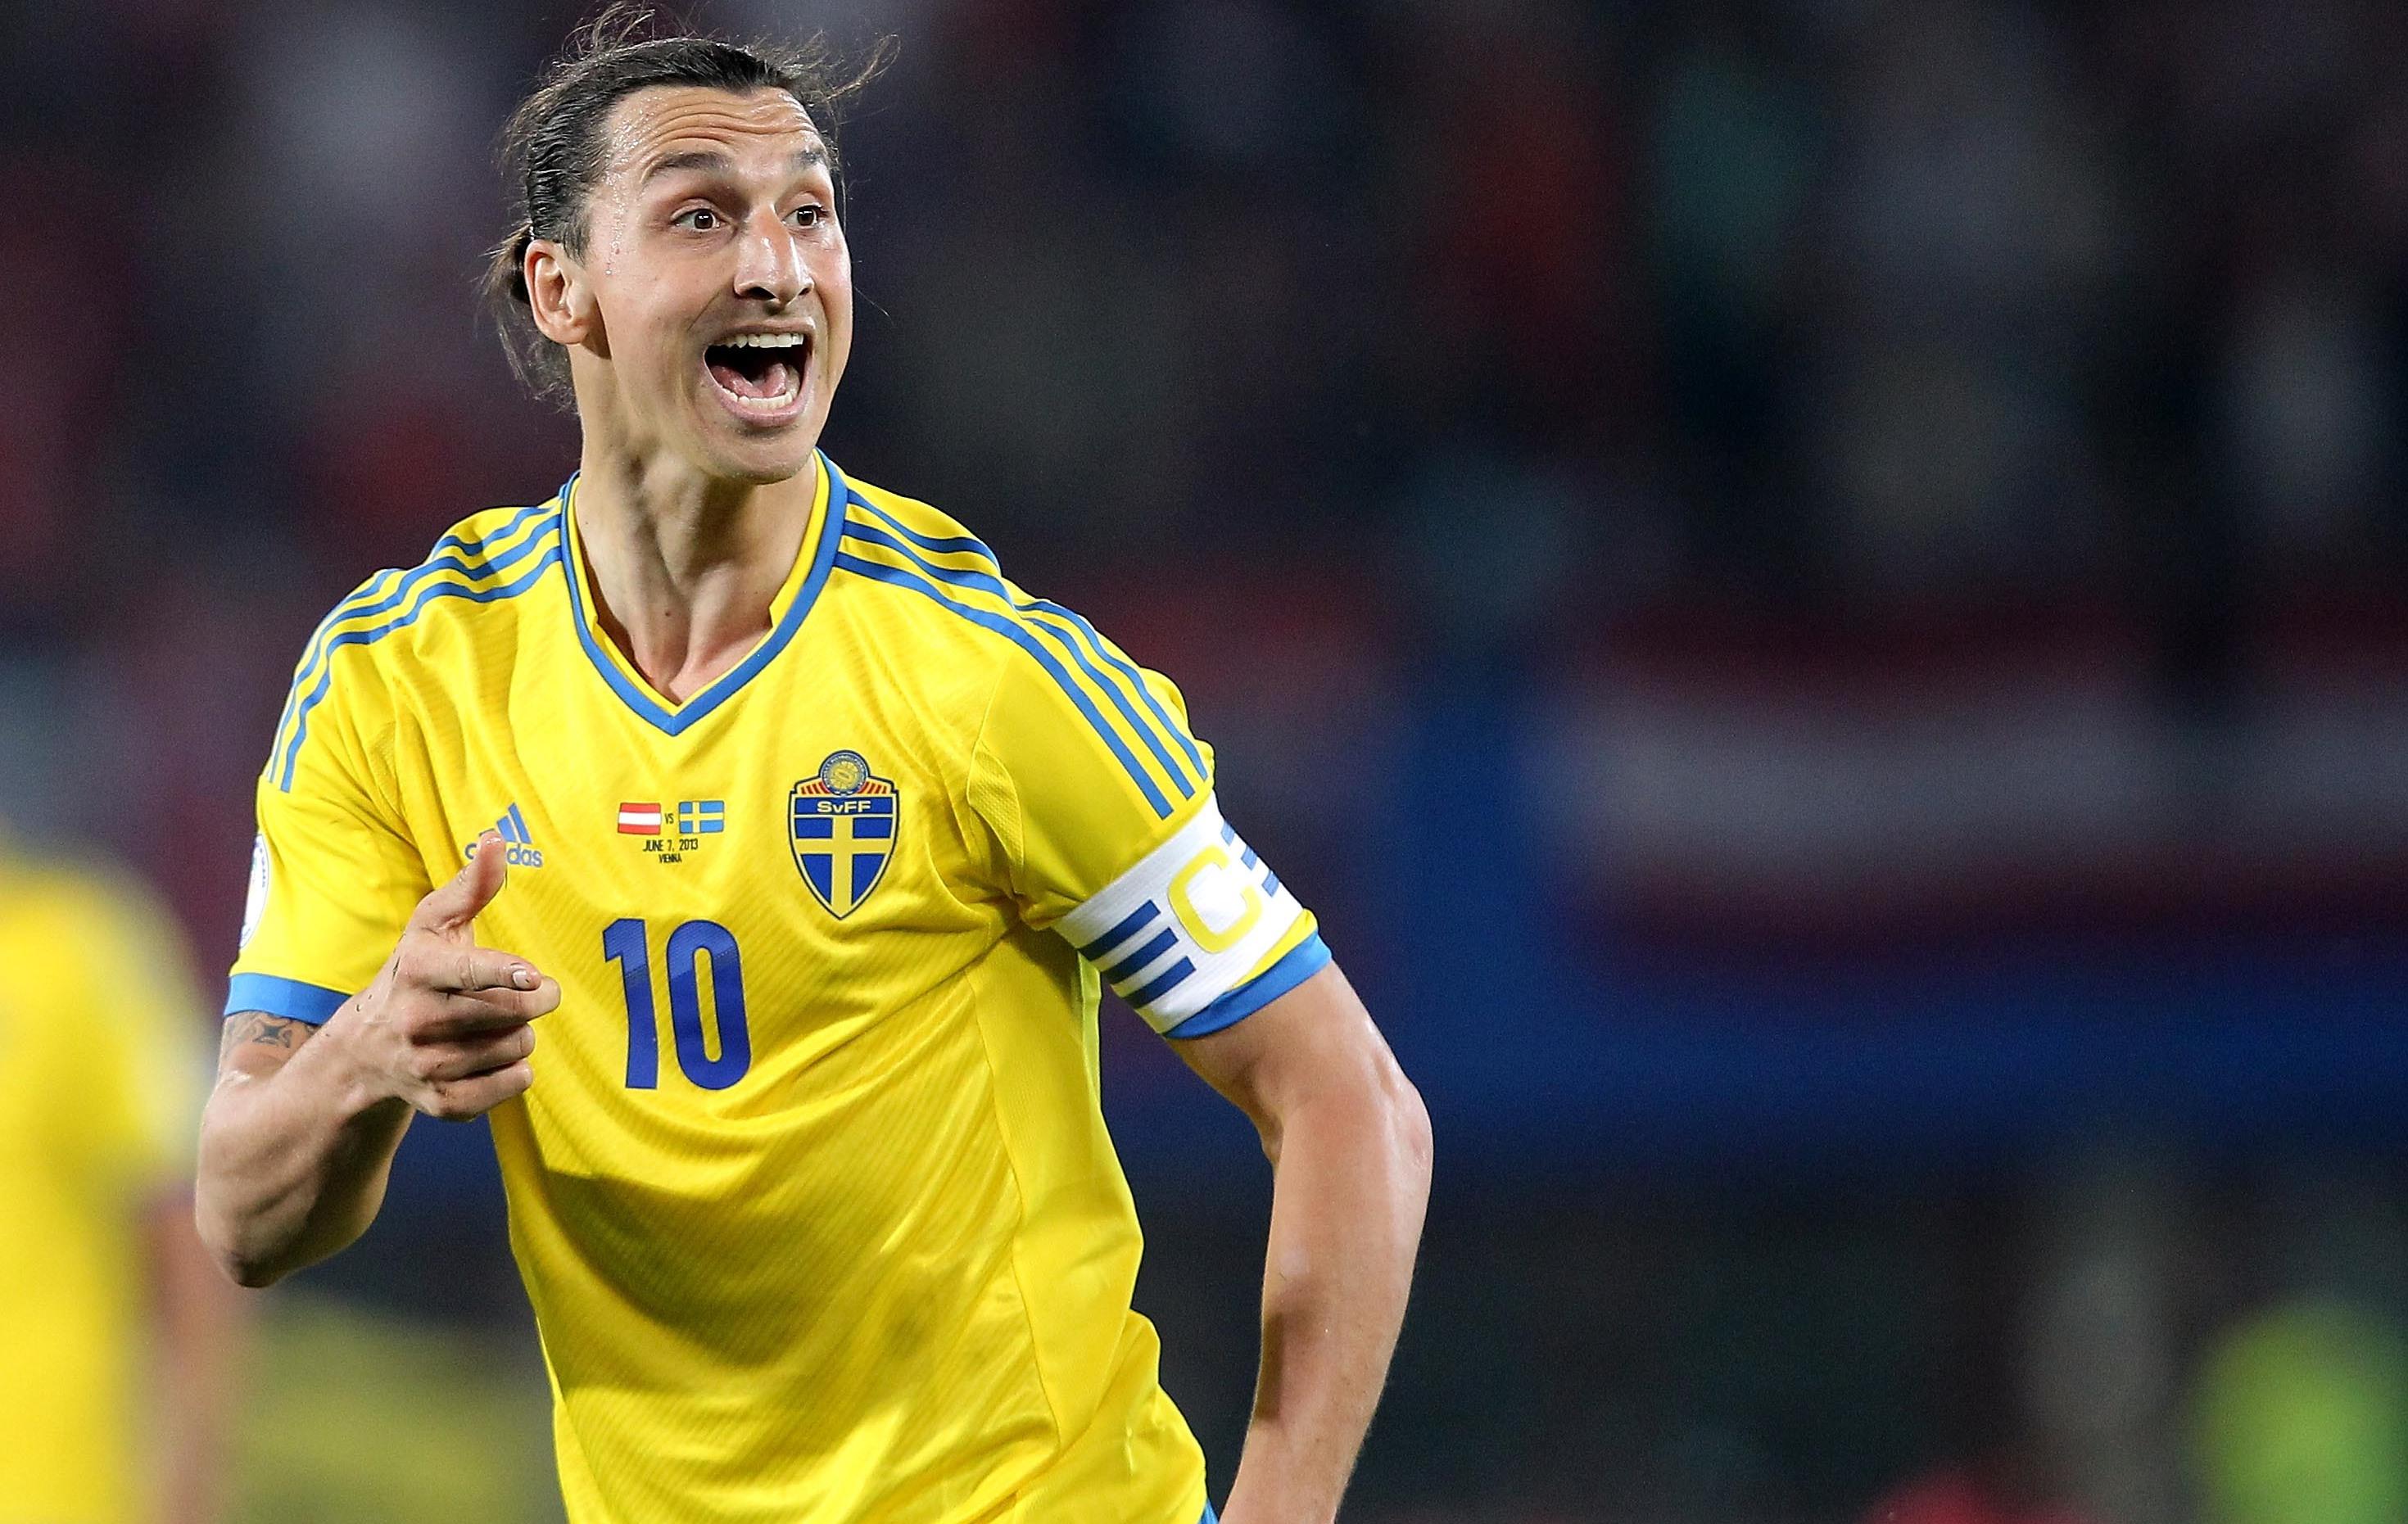 La semaine de Zlatan Ibrahimovic #1